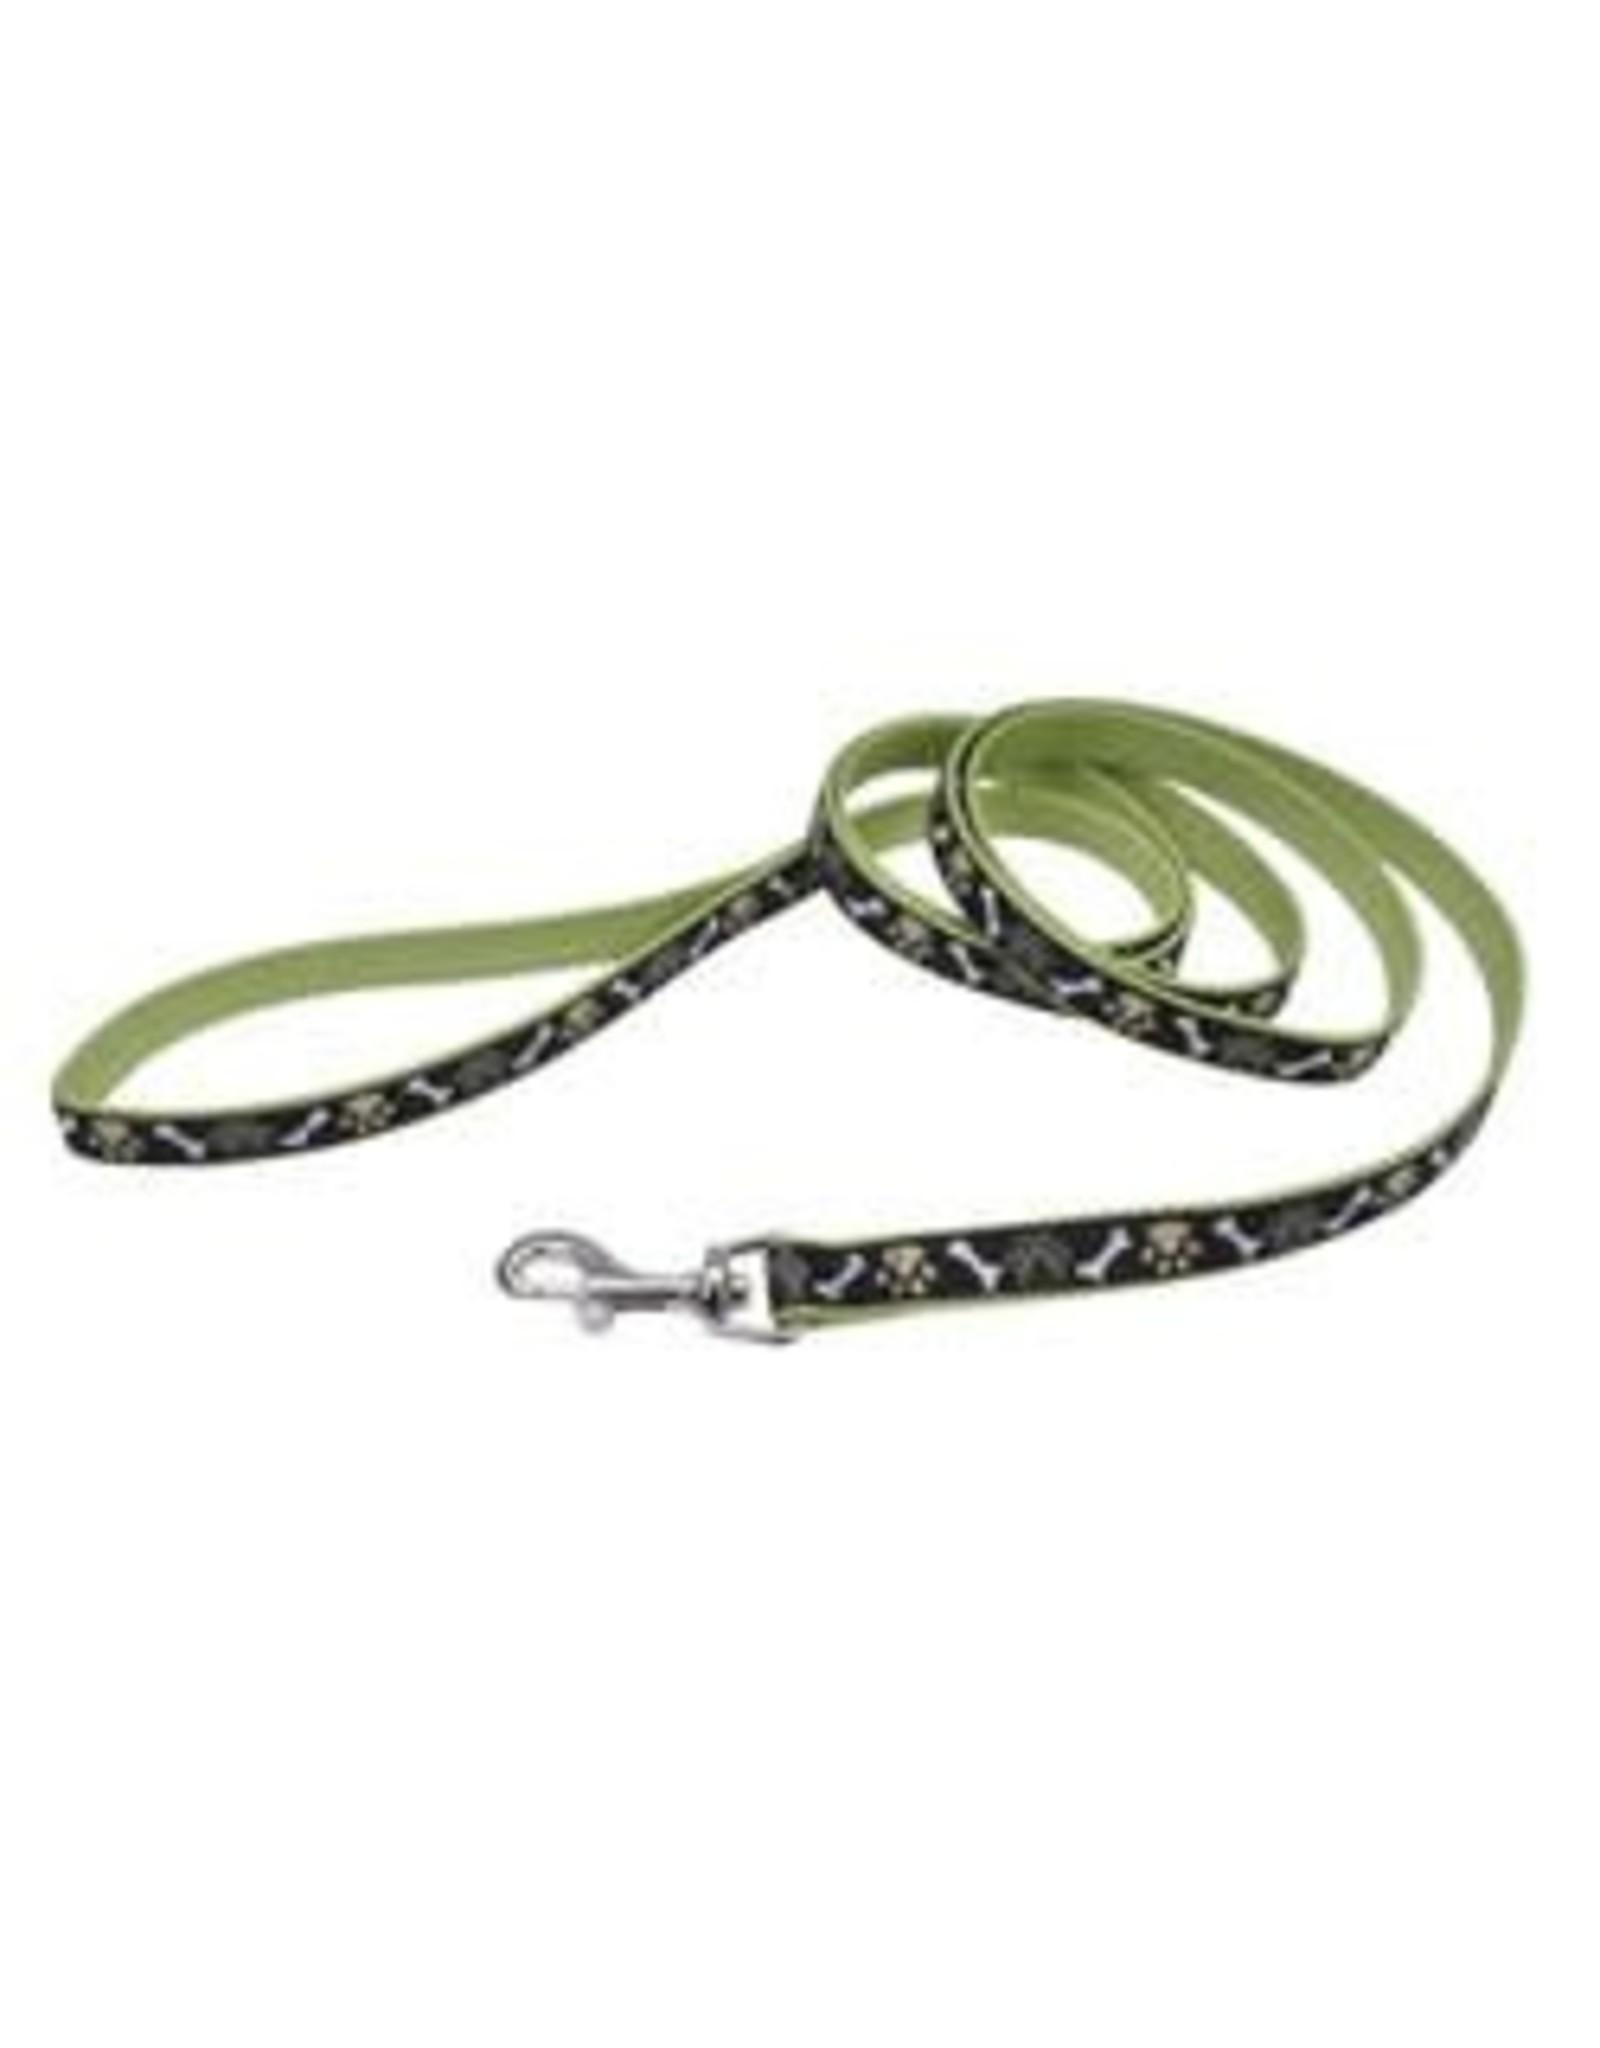 Coastal Coastal Ribbon Dog Leash - 5/8in x 6ft Brown Paws & Bones